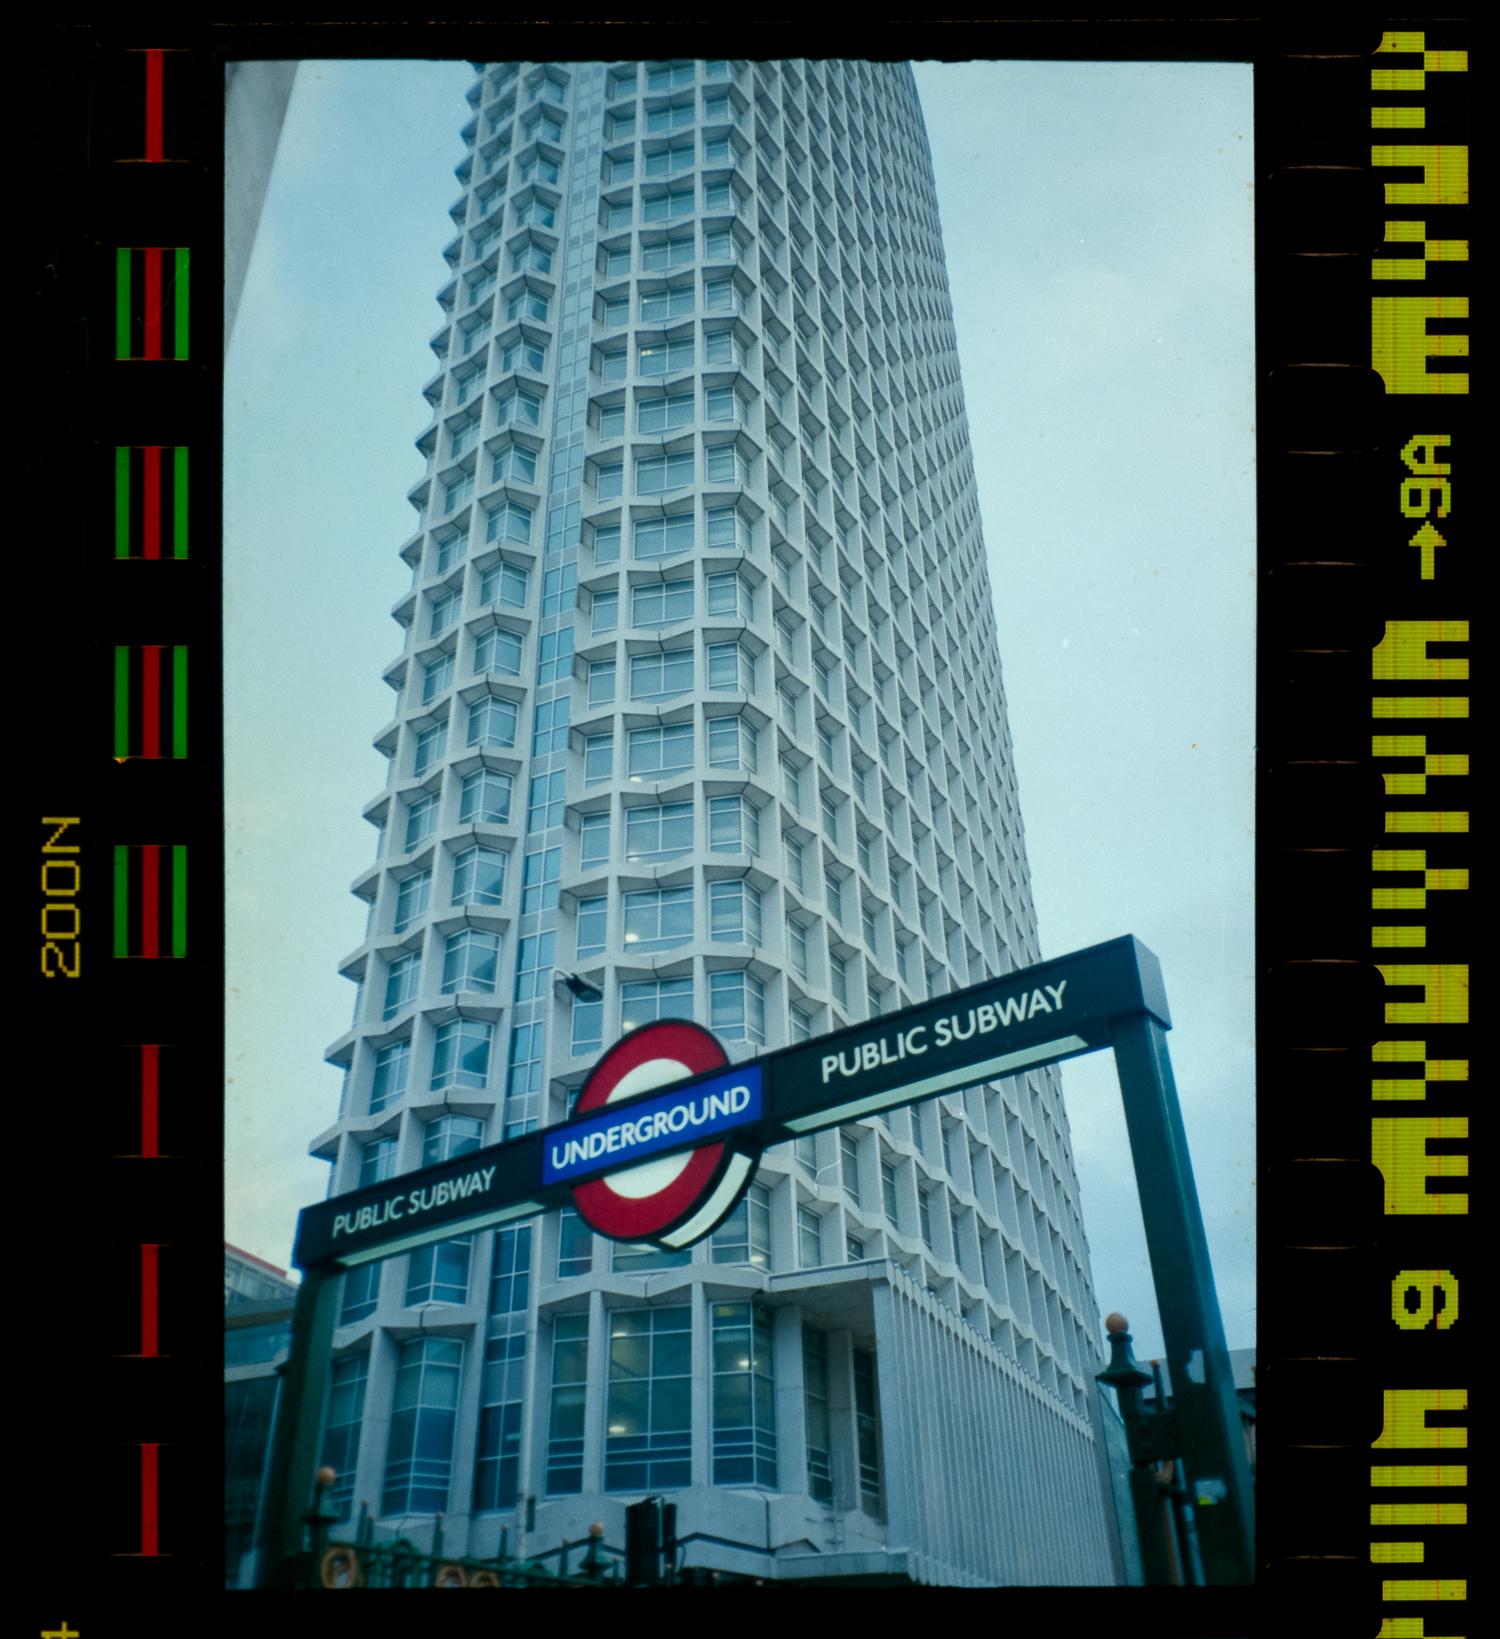 Olympus AZ-1 Zoom 35mm Vintage Film Camera Review Jay McLaughlin Agfa Vista Expired Tube Underground Tottenham Court Road Centrepoint